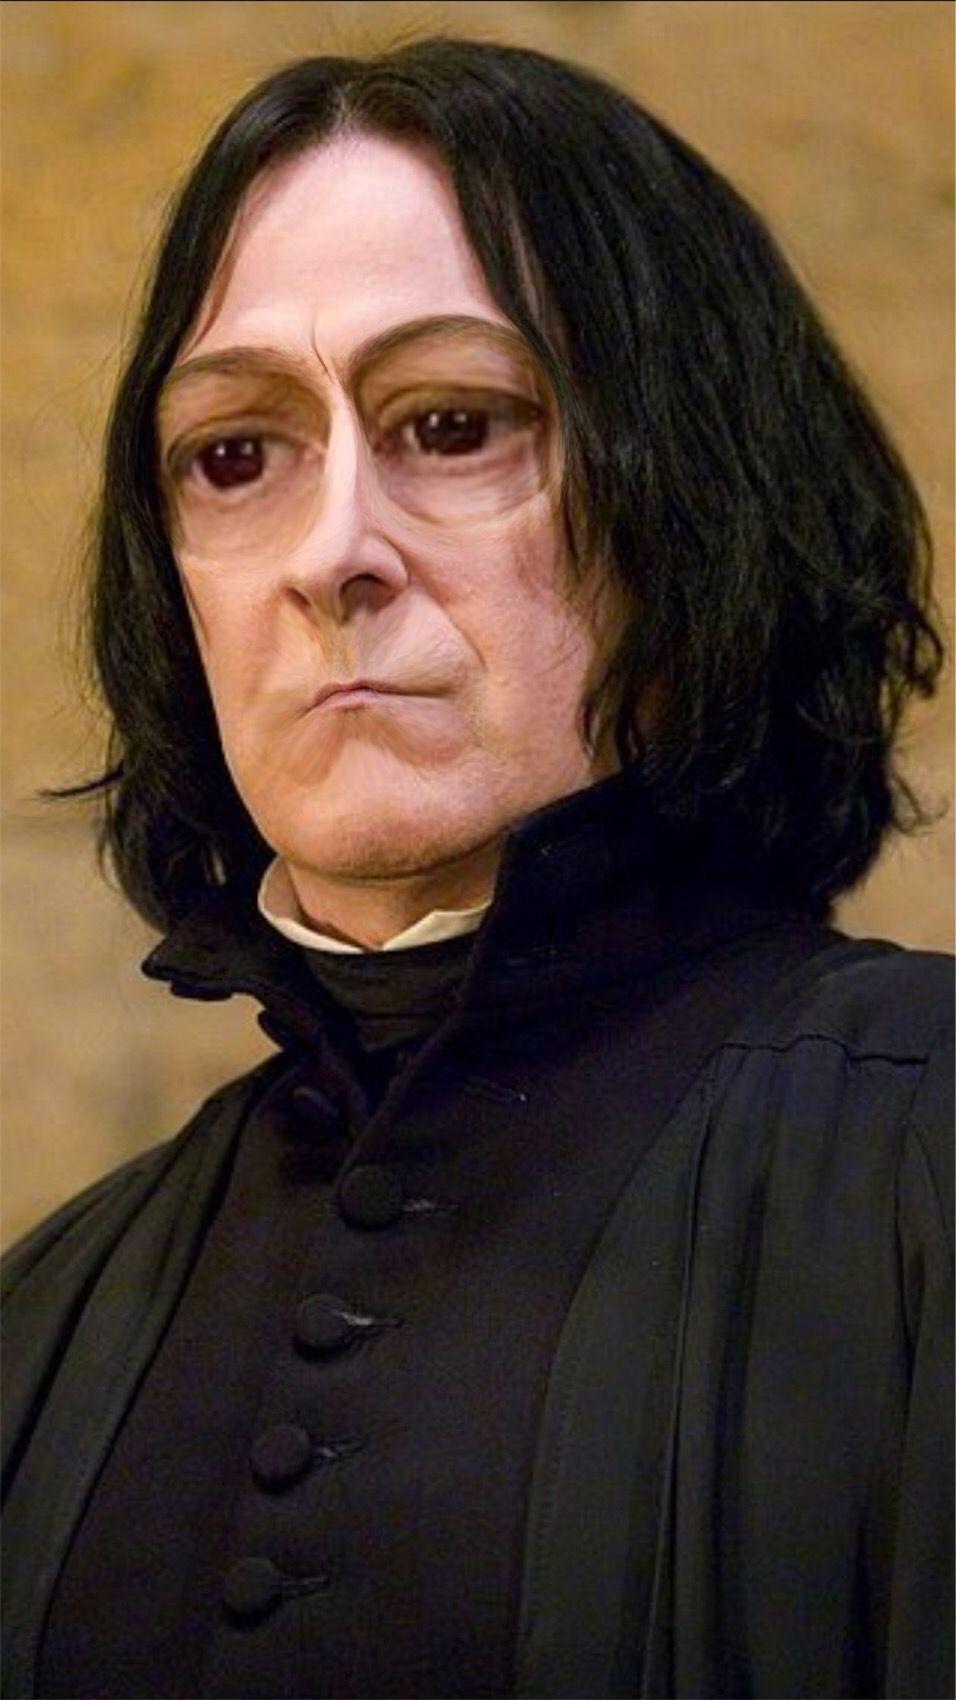 Hogwarts Whatsapp Harry Potter Stickers Harry Potter Curses Harry Potter Cast